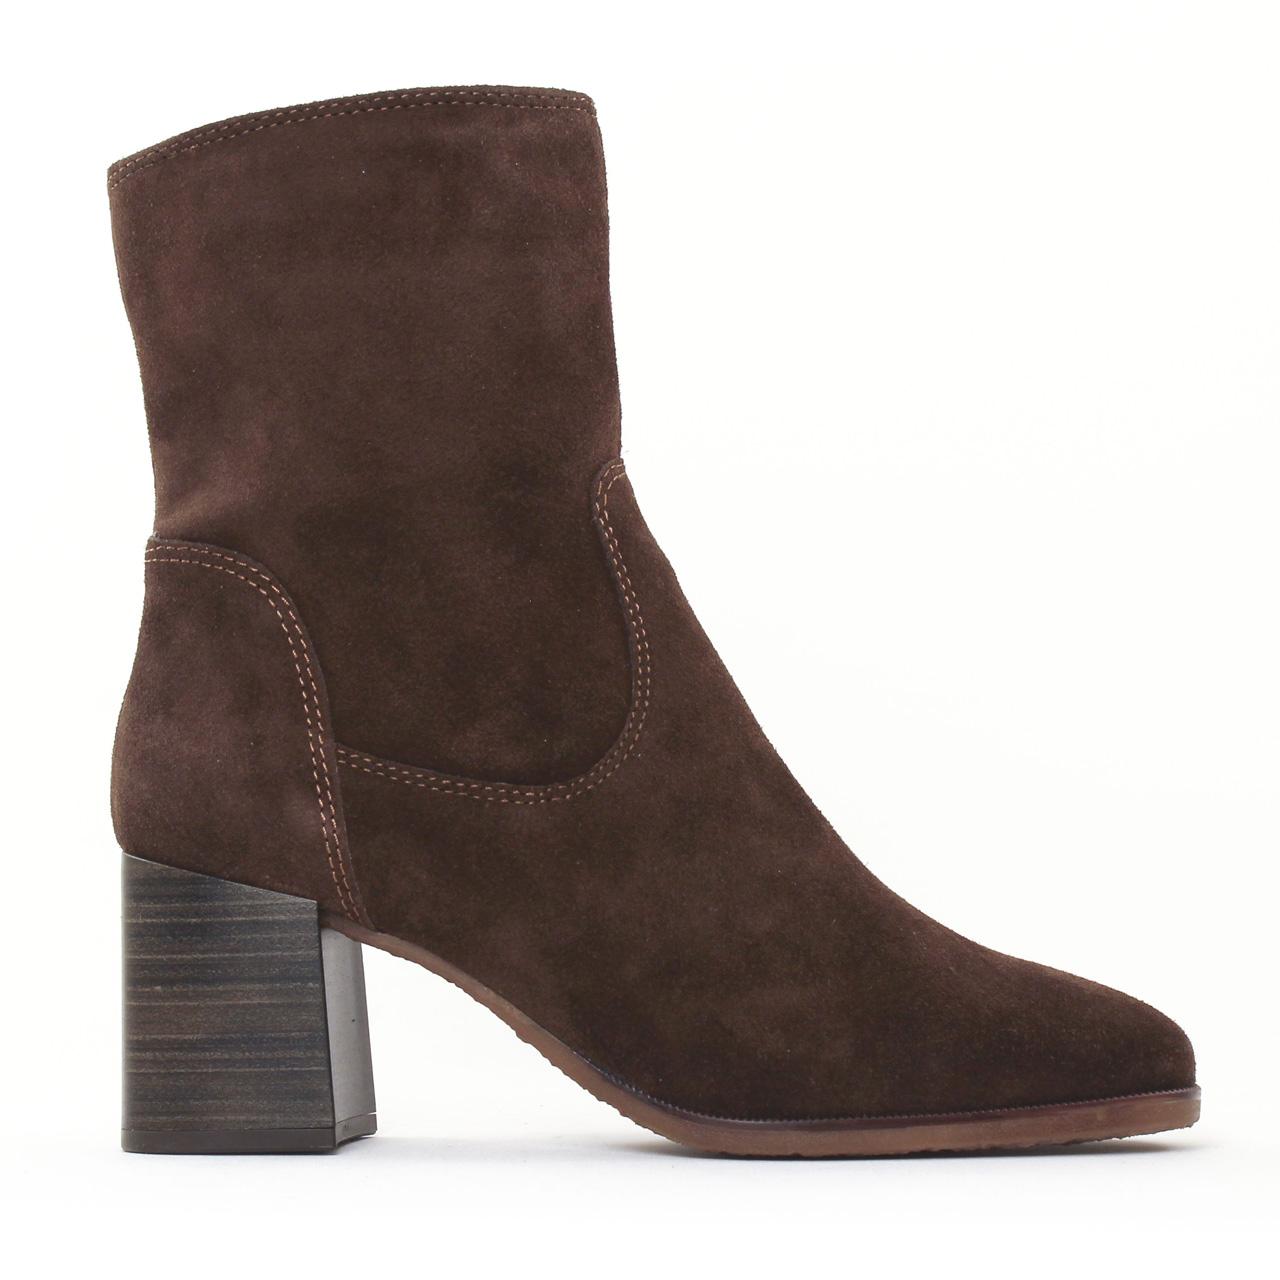 ba78412ad Tamaris 25478 Chocolat | boot talon marron automne hiver chez TROIS ...